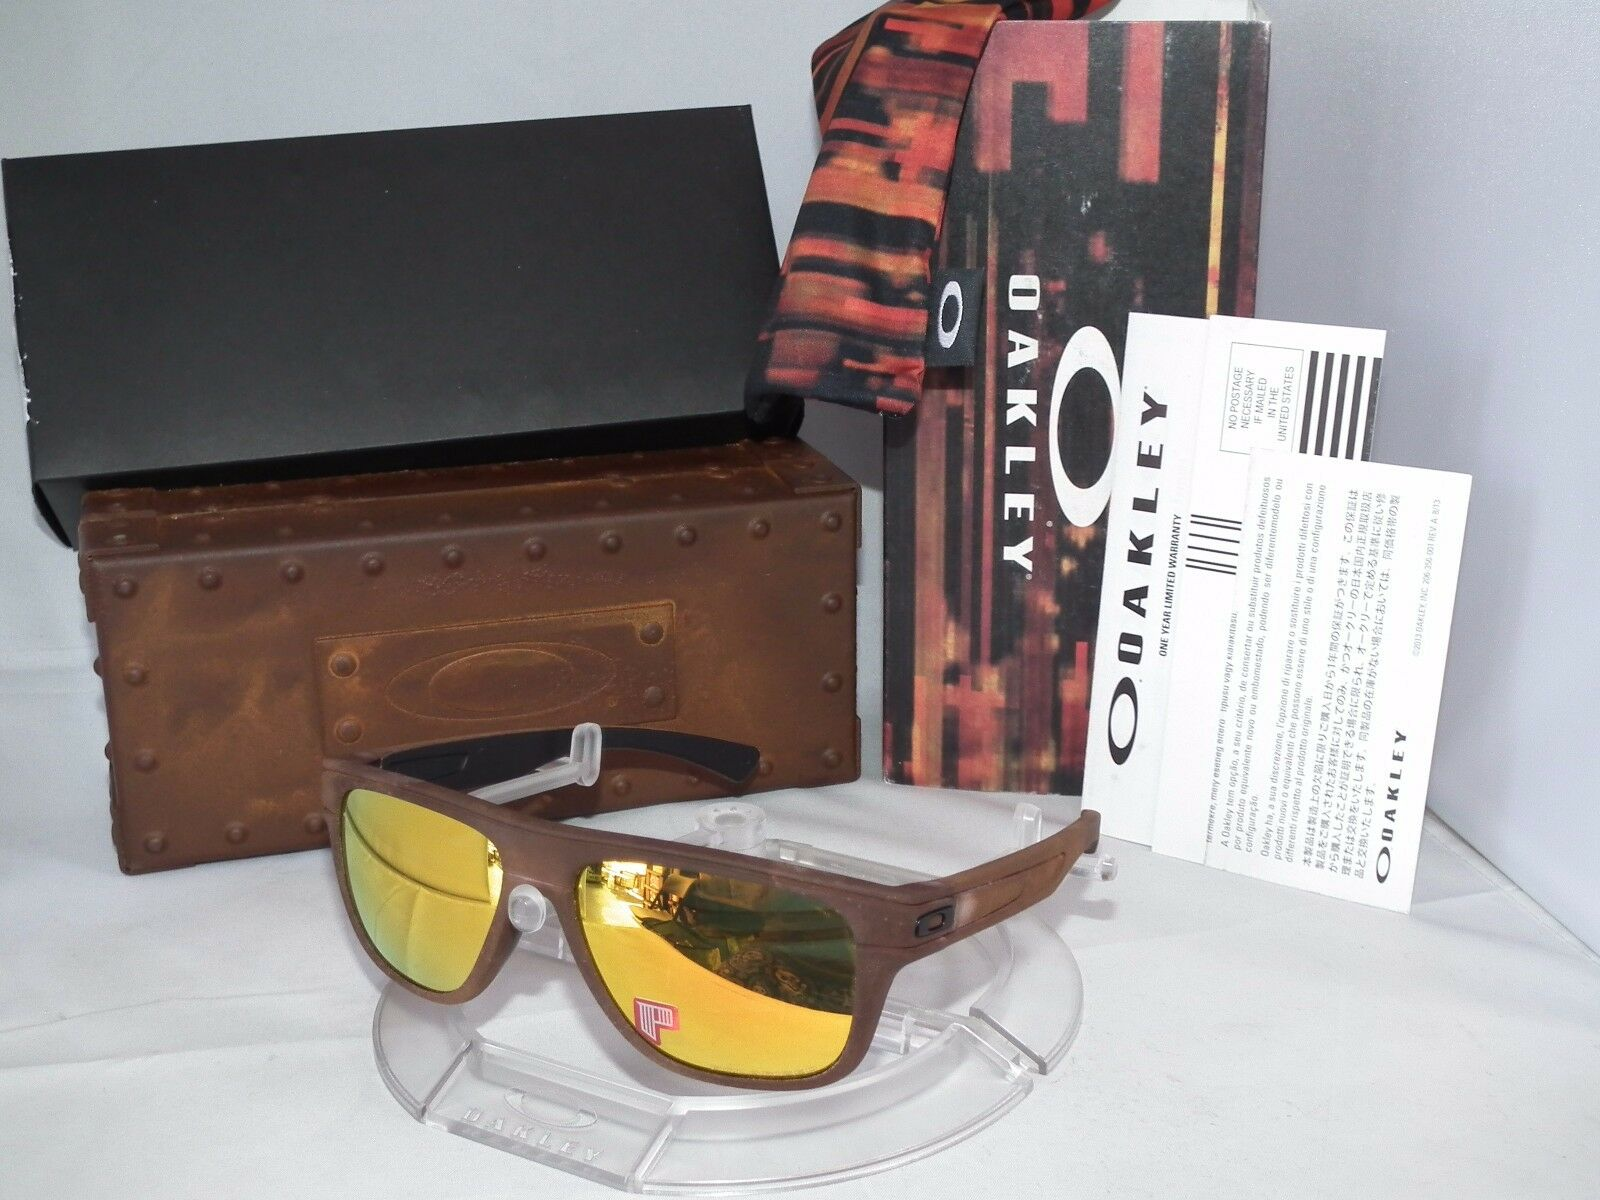 Tolle Oakley E Draht 2 1 Fotos - Elektrische Schaltplan-Ideen ...